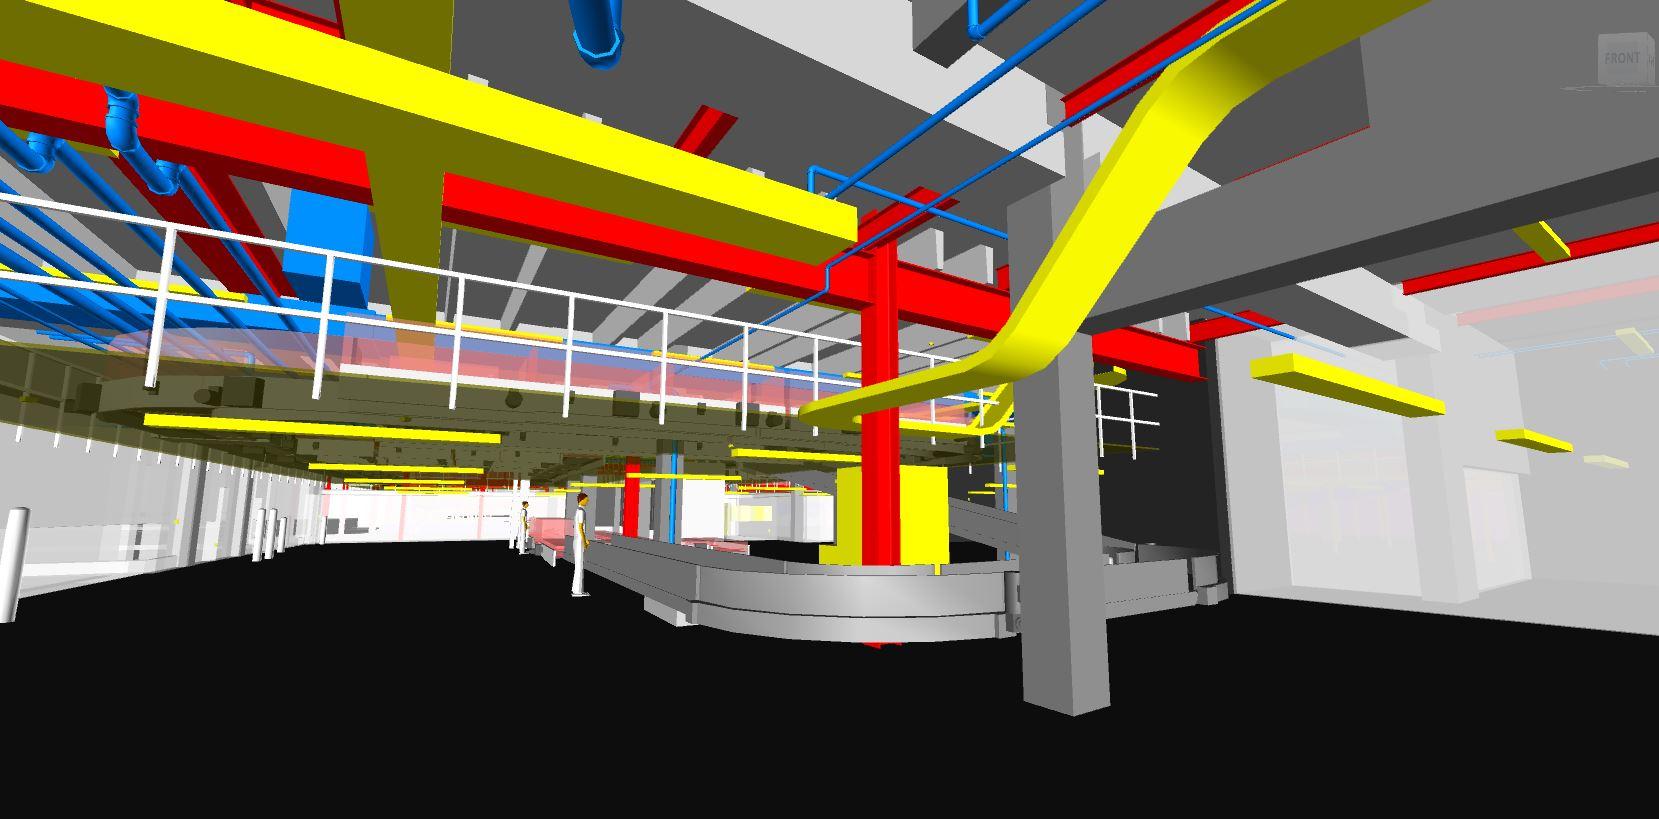 VIRTUAL BUILDING CONSTRUCTION 4